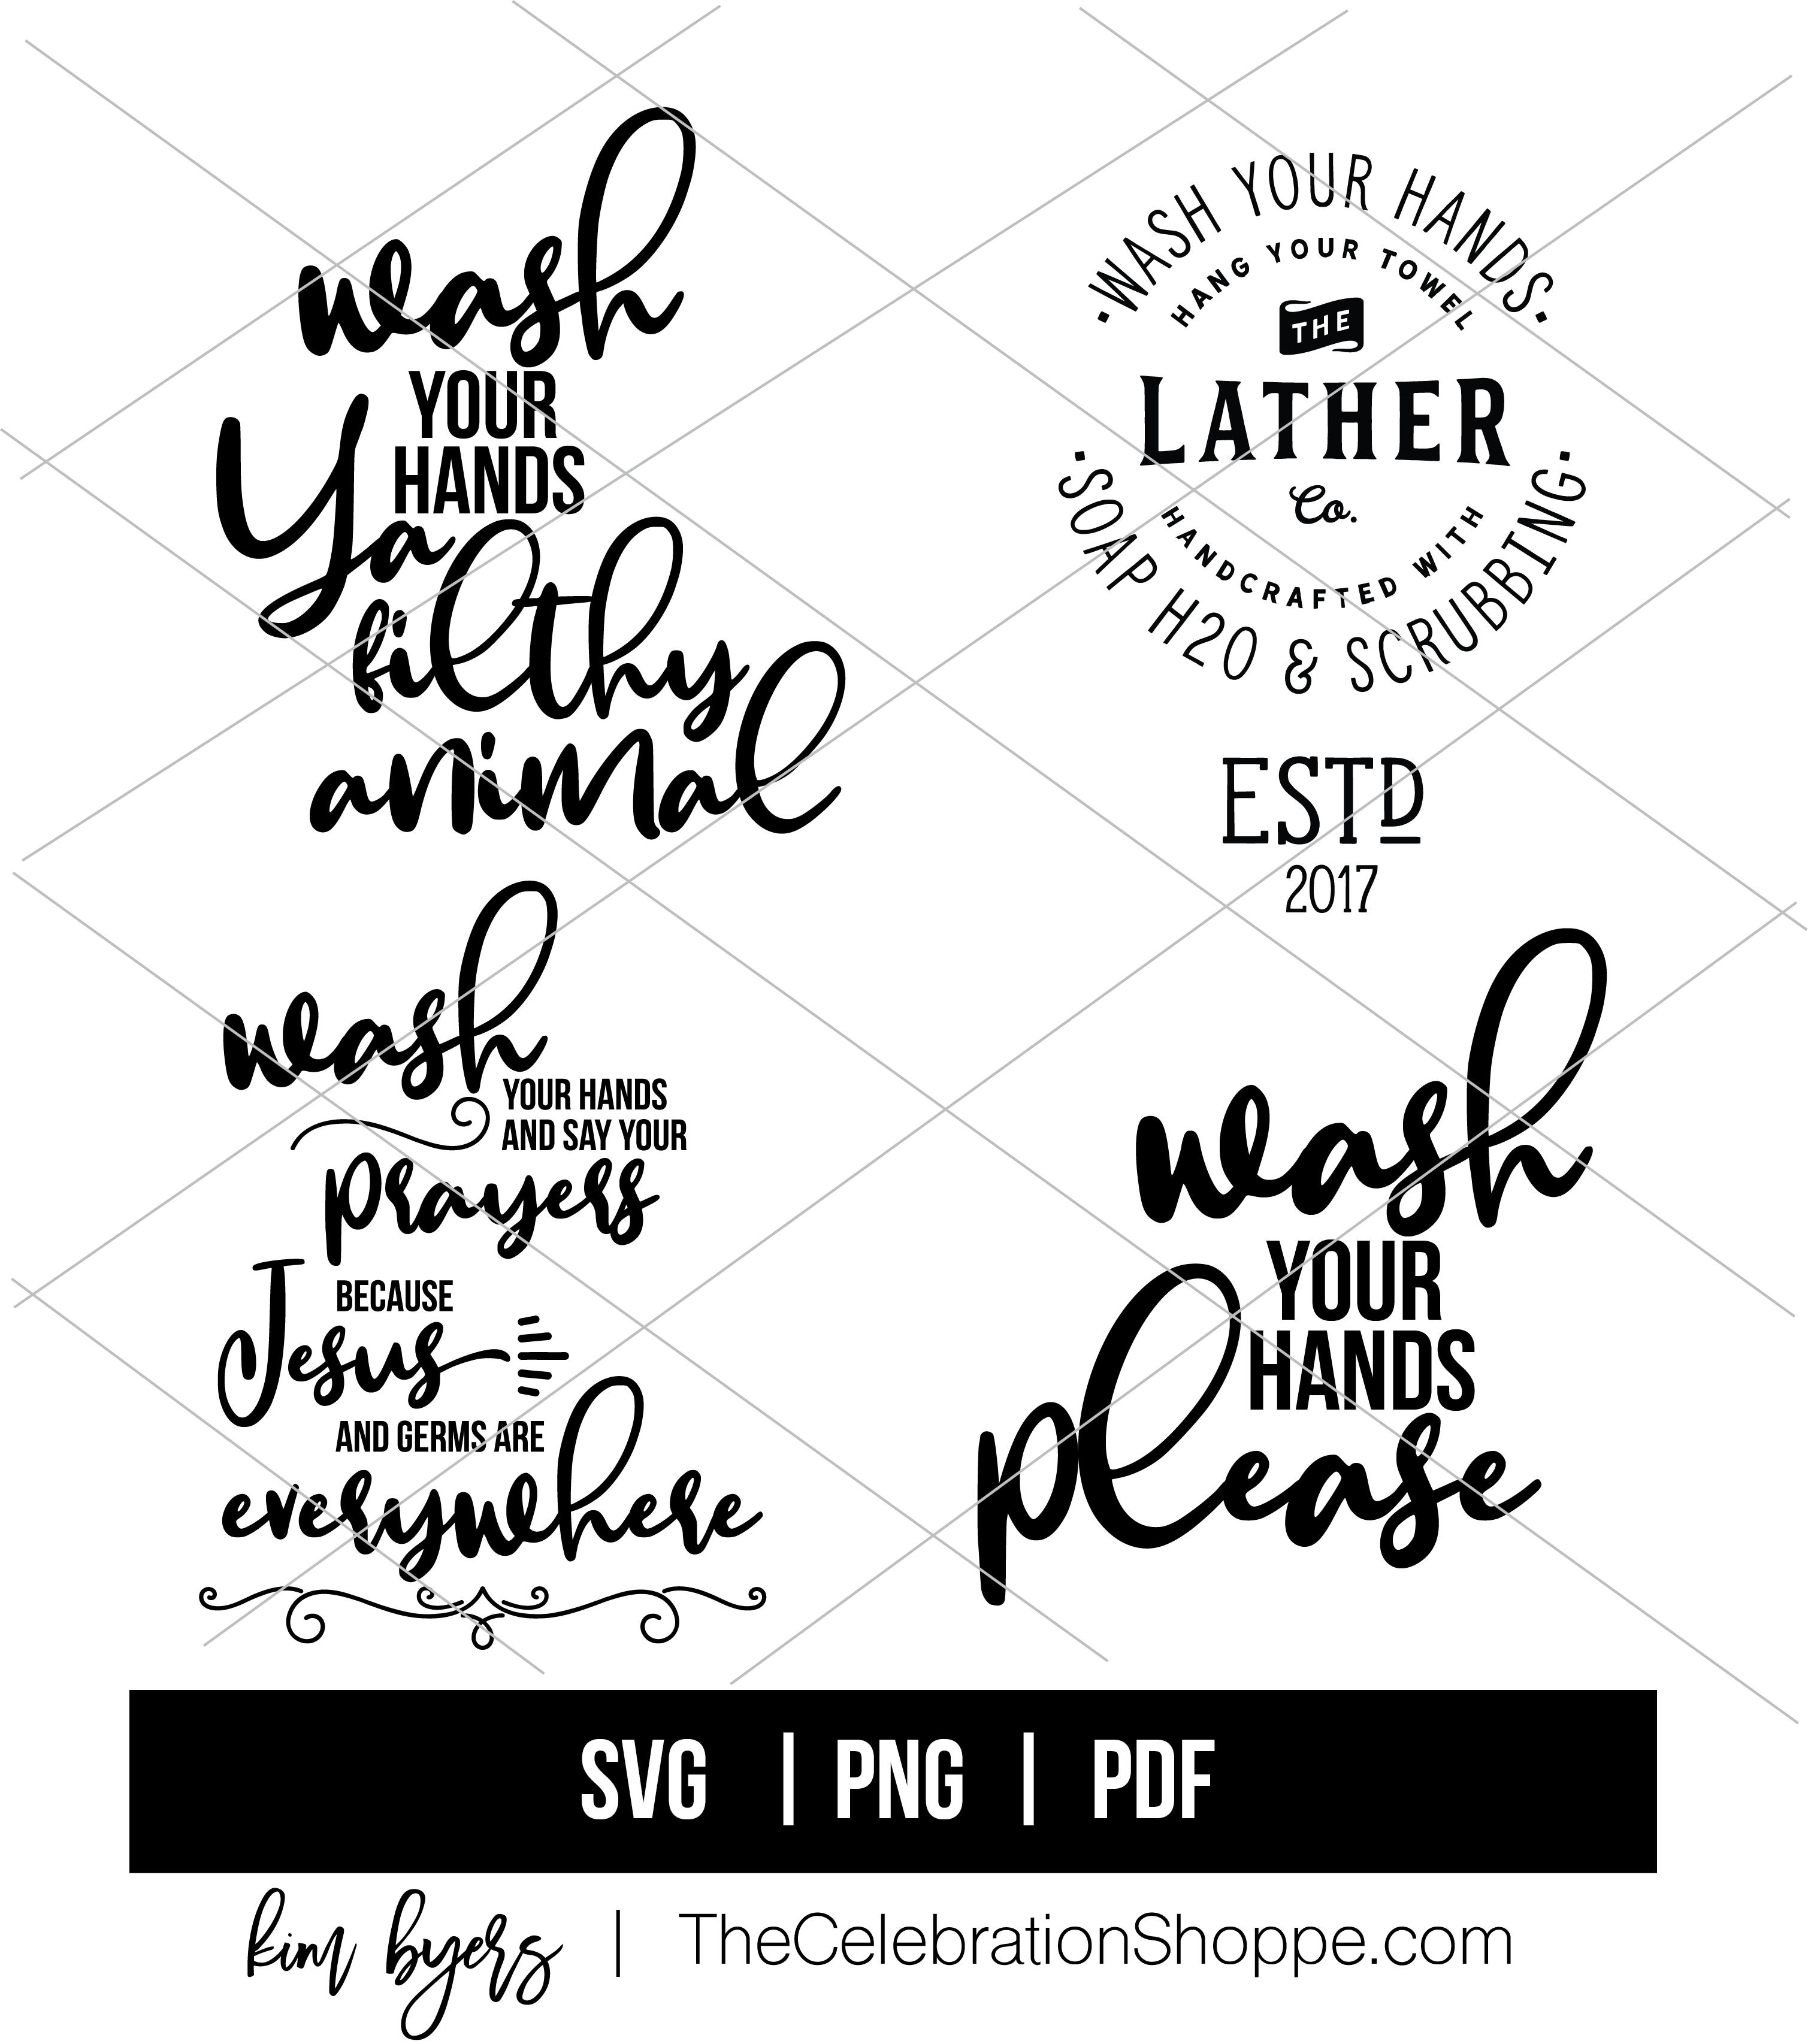 Wash Your Hands SVG Bundle Kim Byers